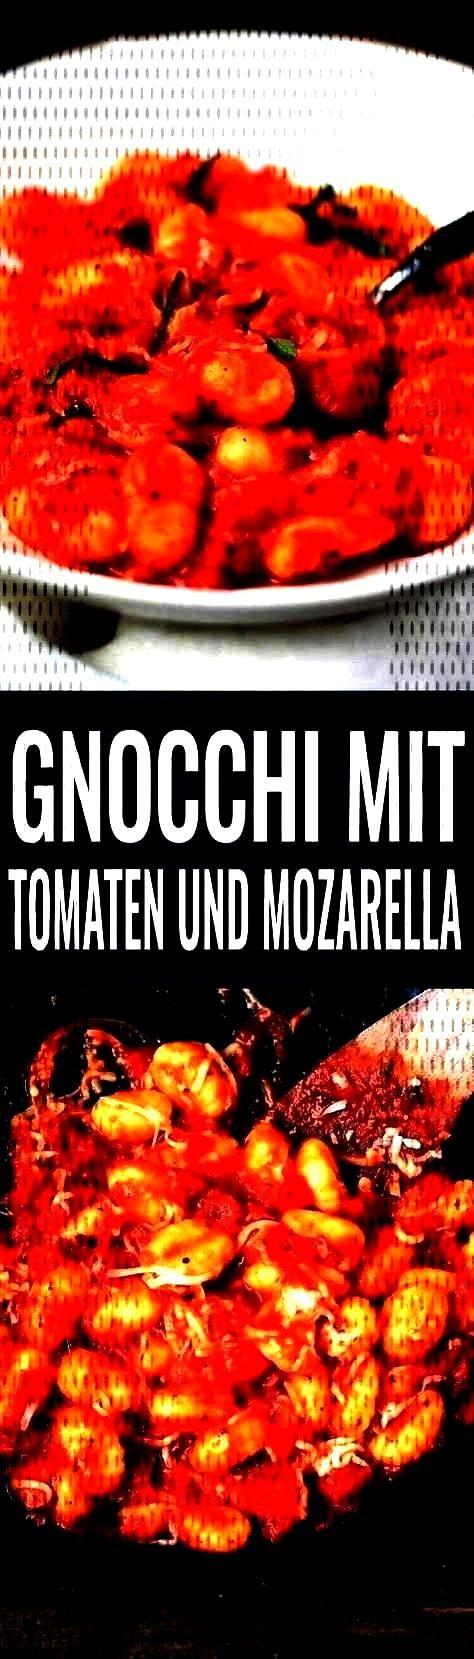 sauce and mozzarella - Gnocchi with tomato sauce and mozzarella. This recipe takes 15 with tomato